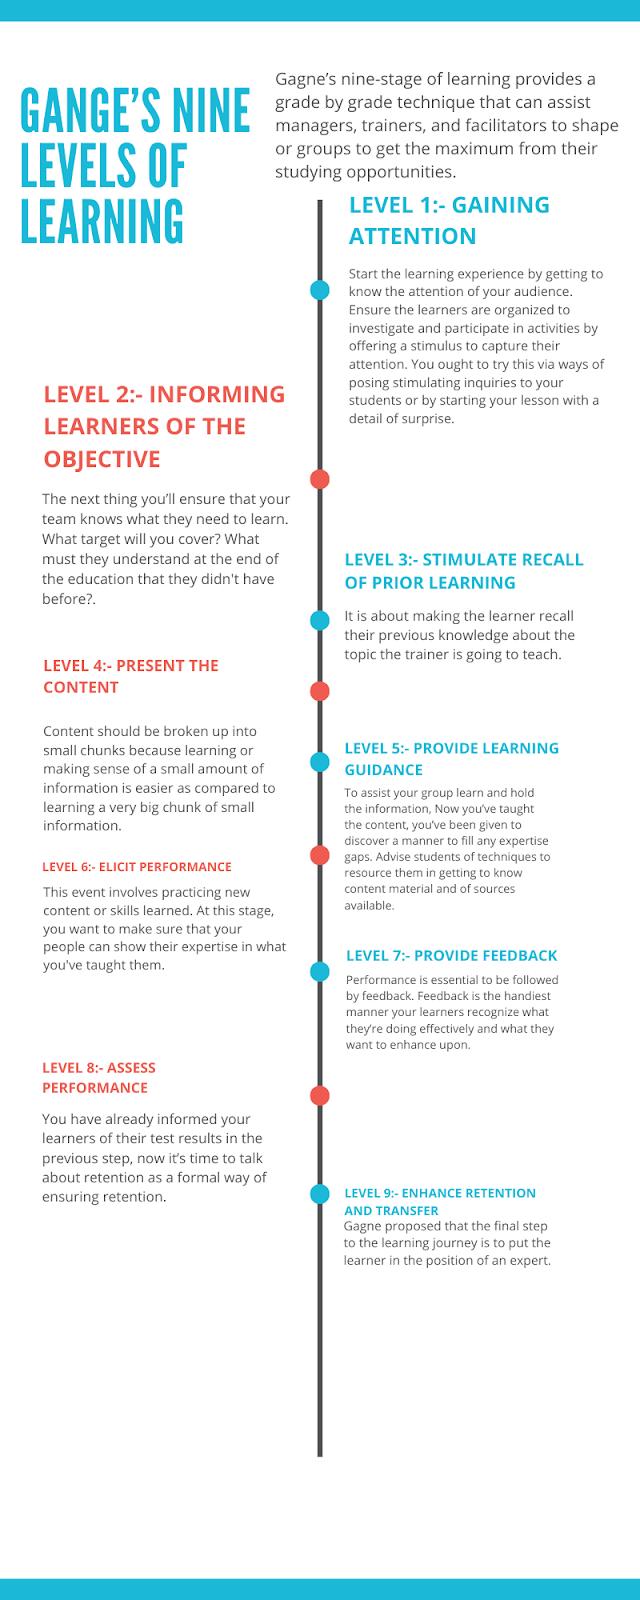 gange's nine level of learning